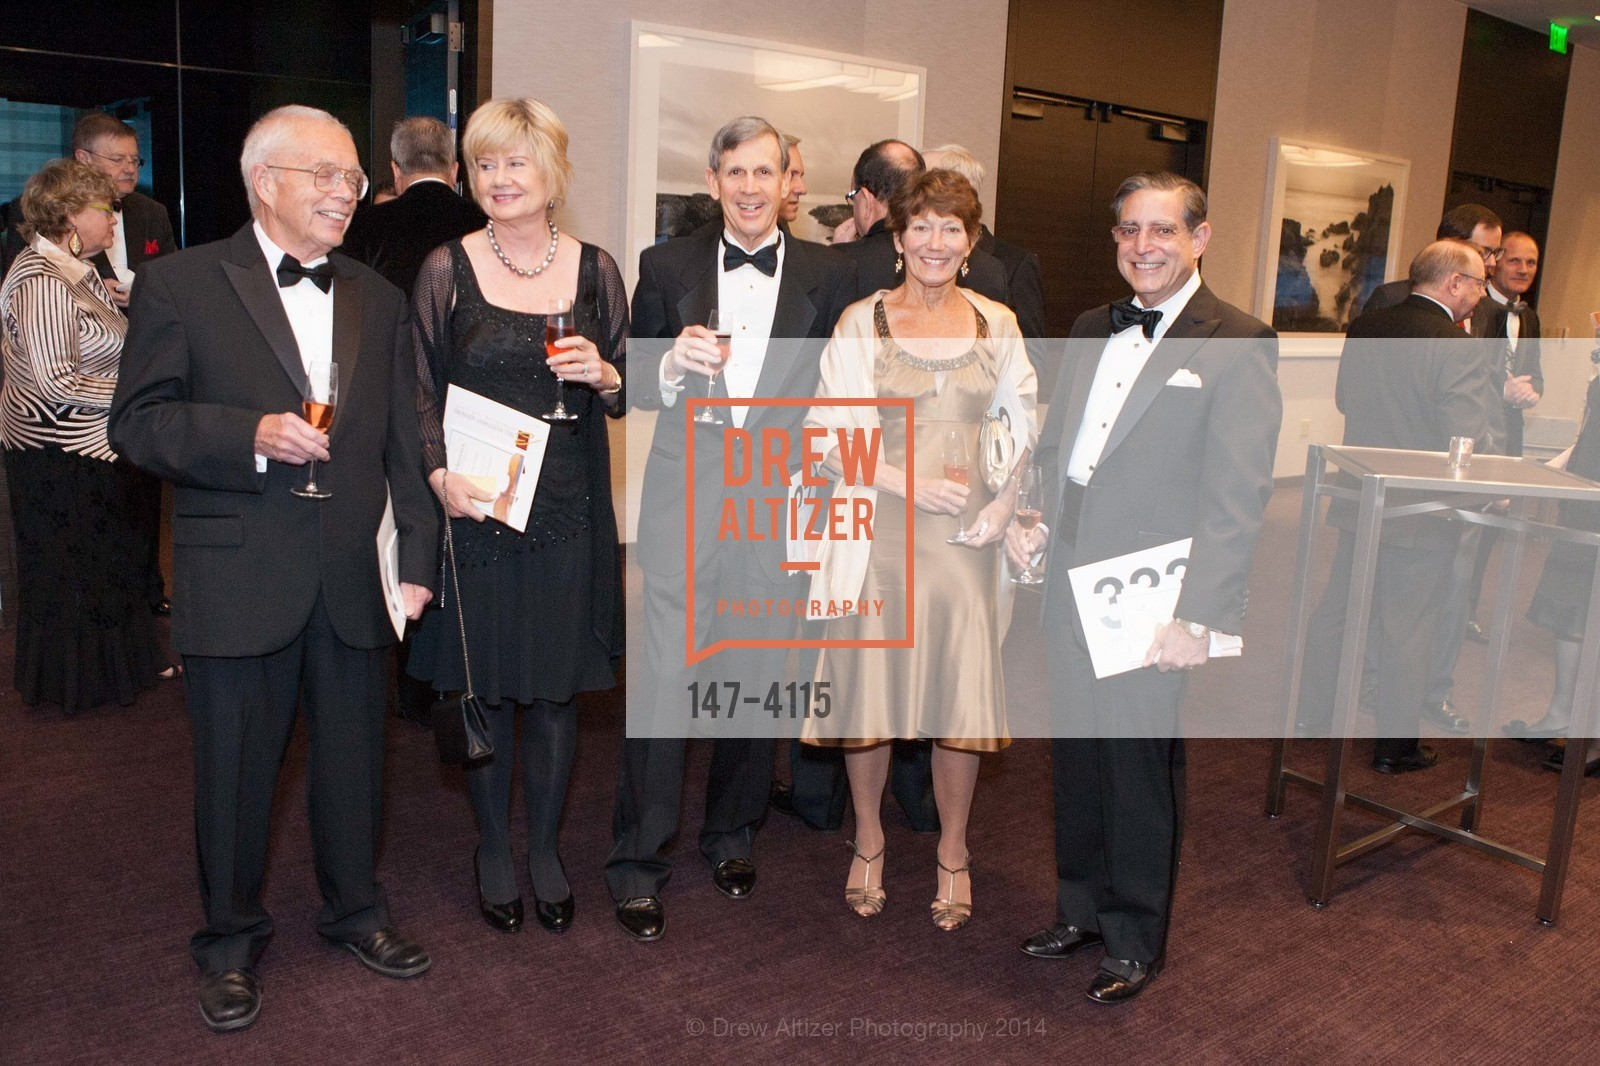 William Lokke, Gabriela Odell, Bruce Tarter, Jeanne Shuler, Paul Sugarman, Photo #147-4115